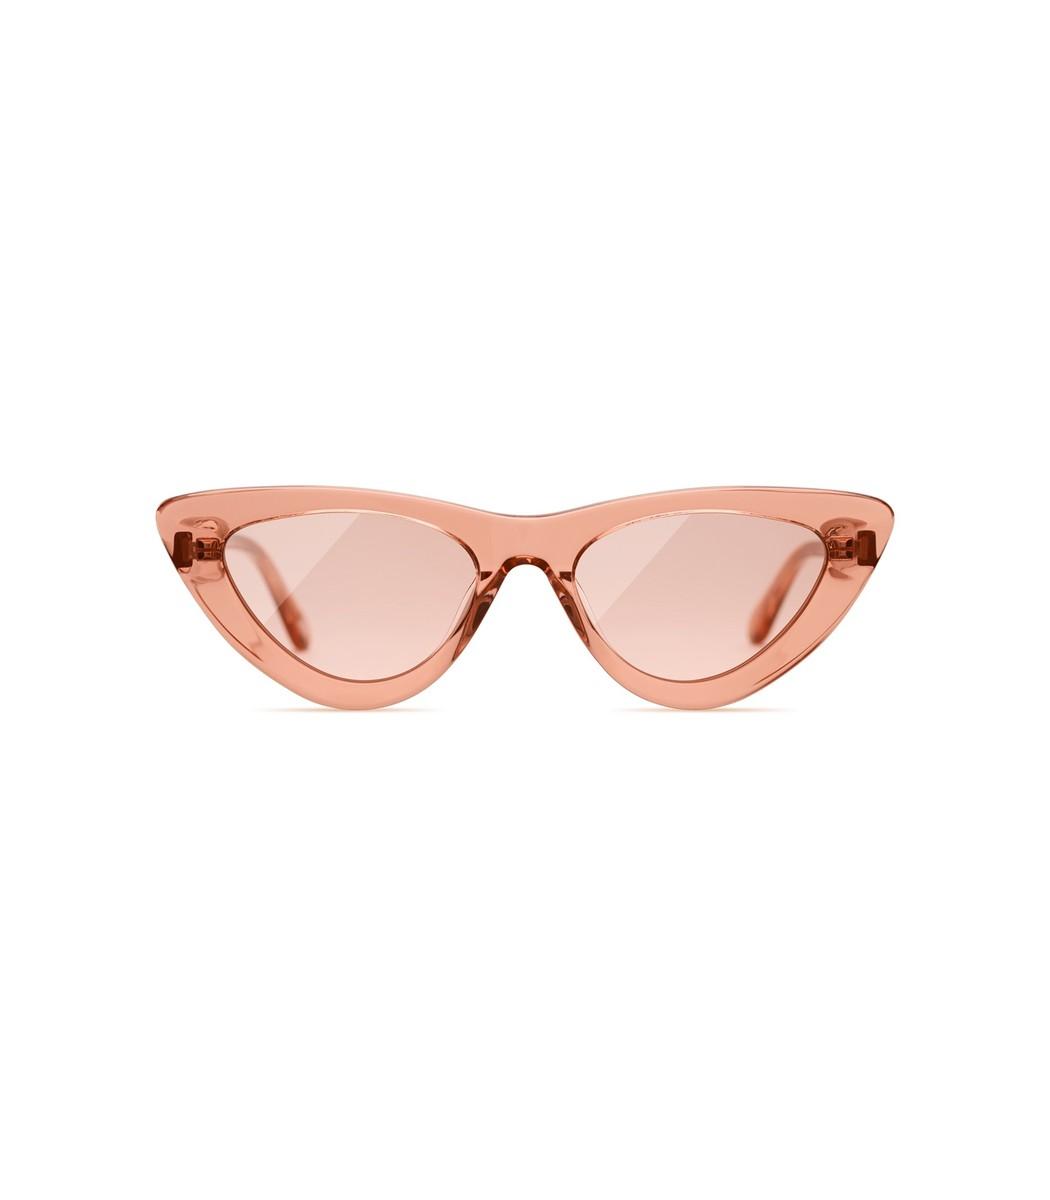 Chimi Sunglasses #006 Clear Sunglasses in Peach